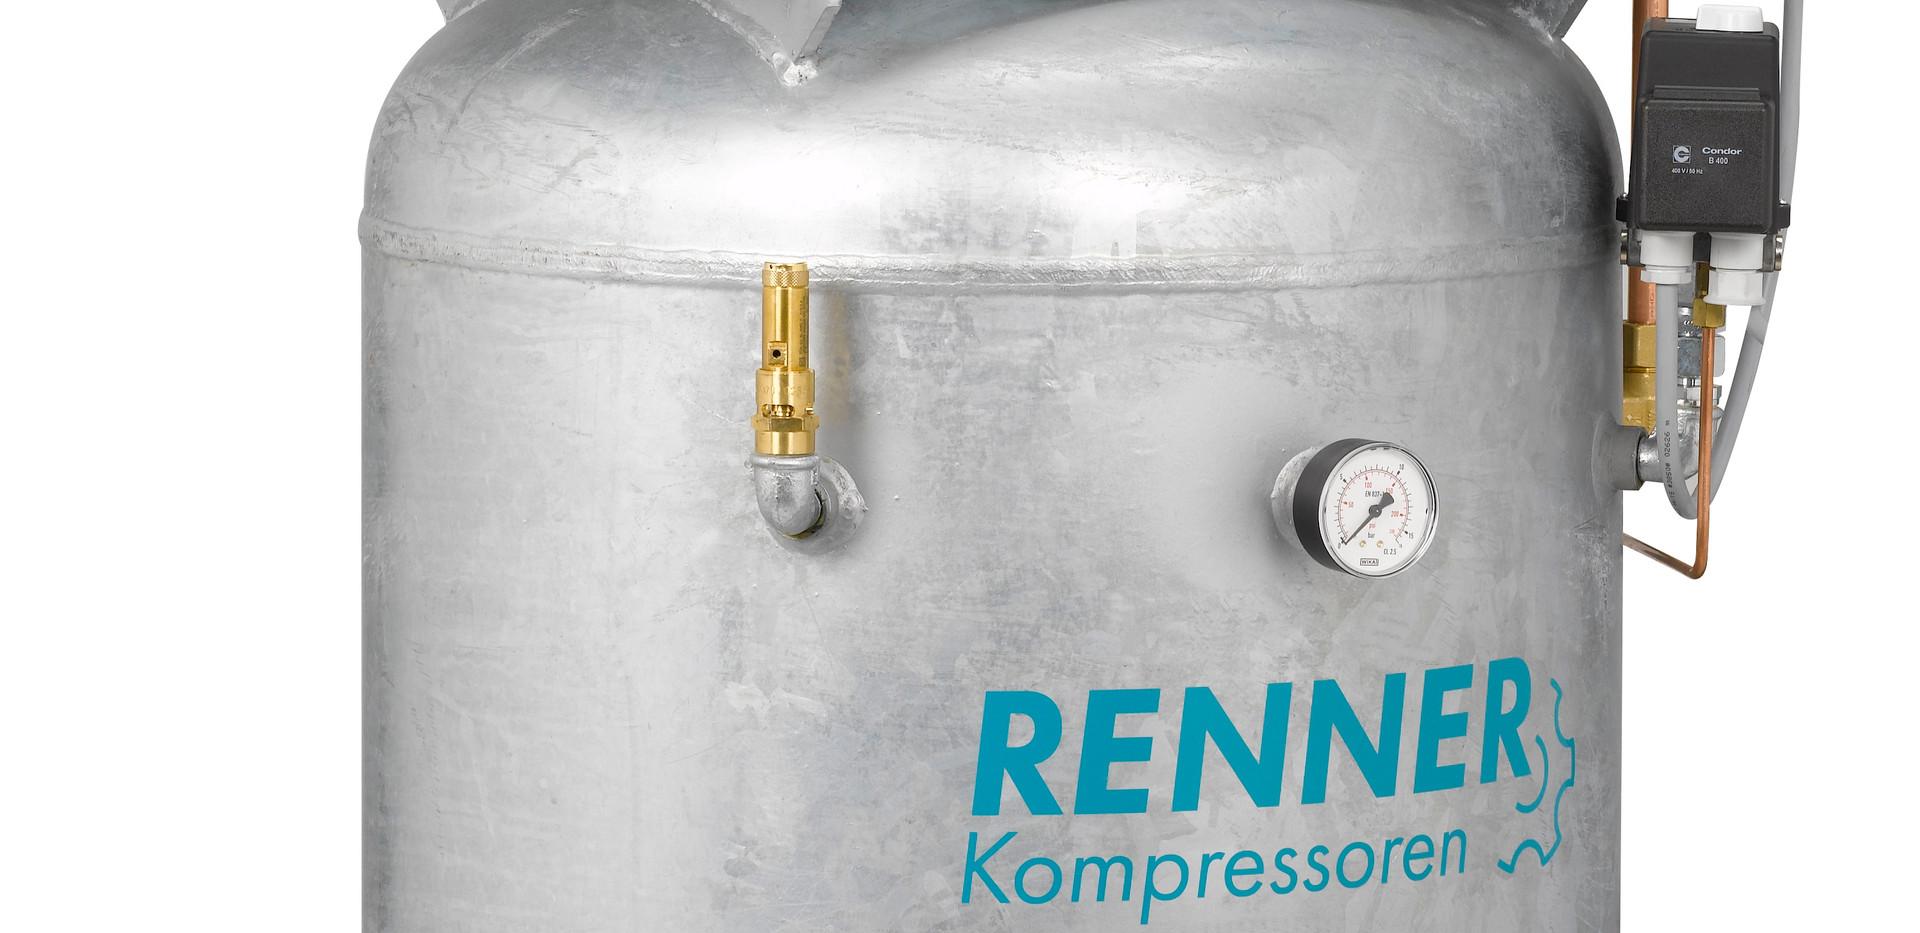 Renner RIKO700-270 Industriële zuigercompressor